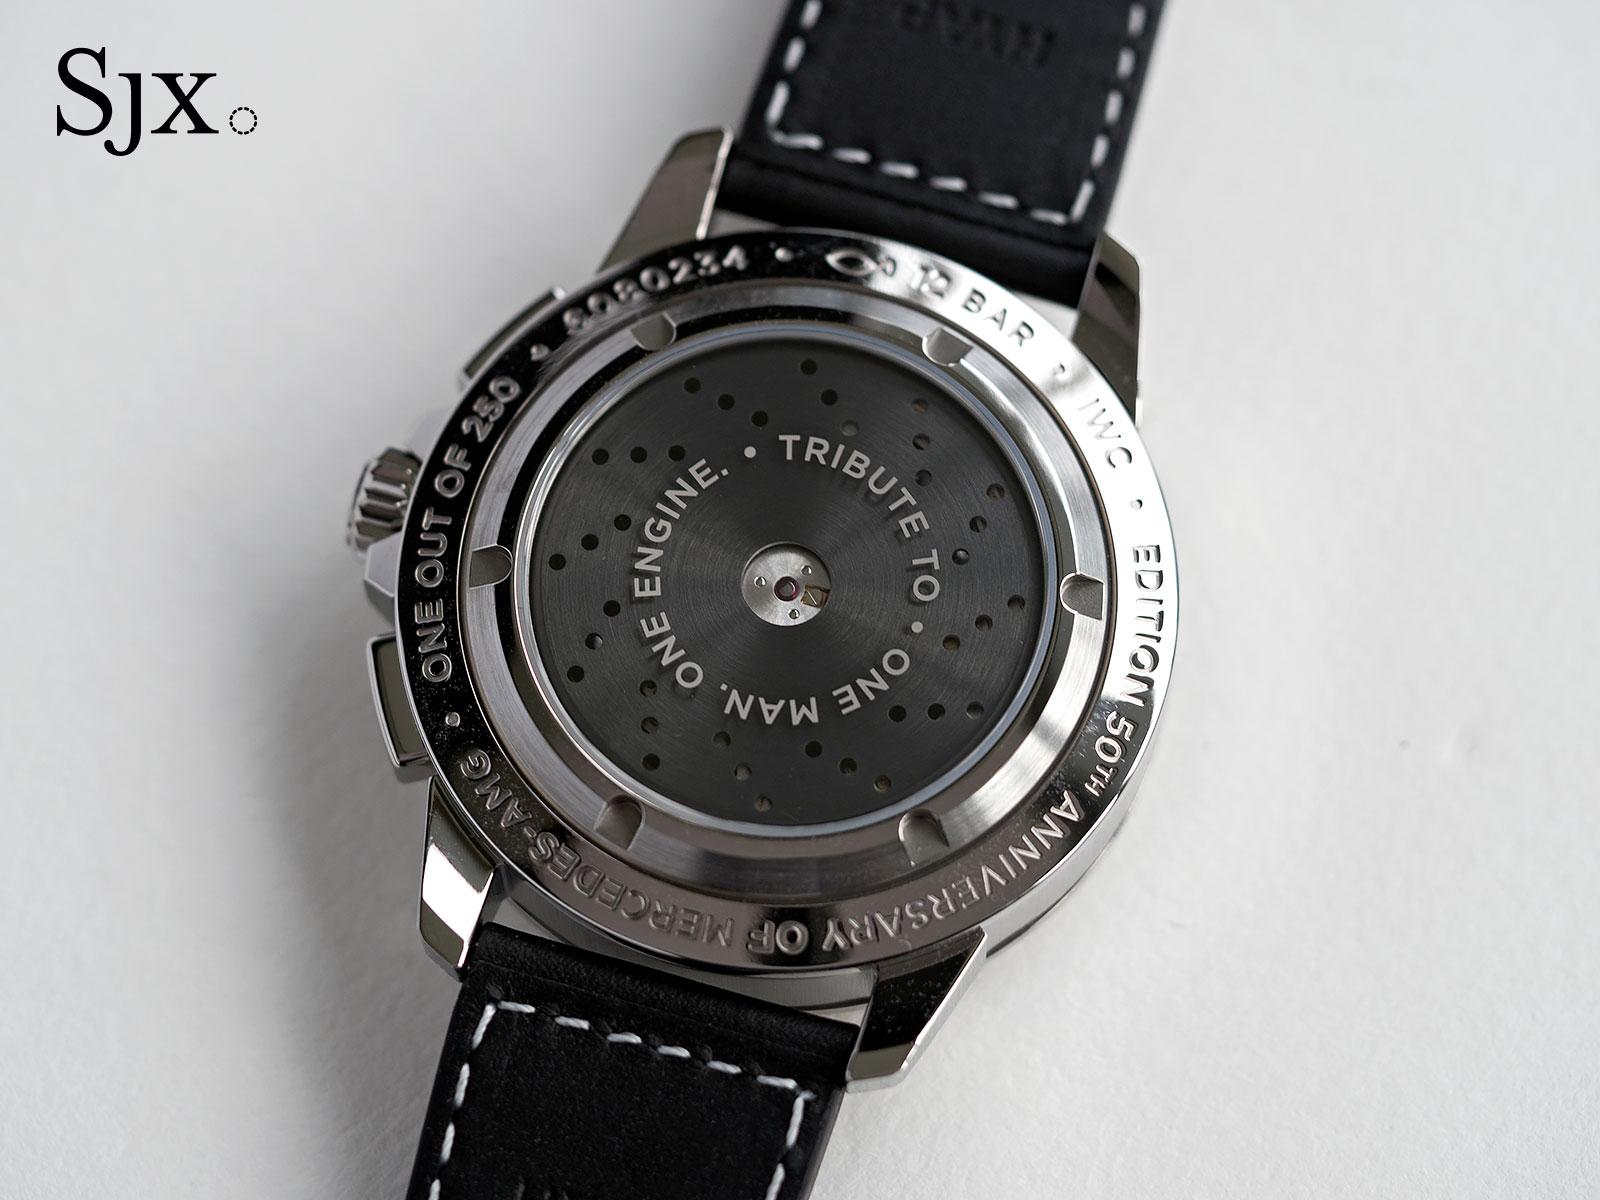 IWC Ingenieur Chronograph 50th Anniversary AMG 6